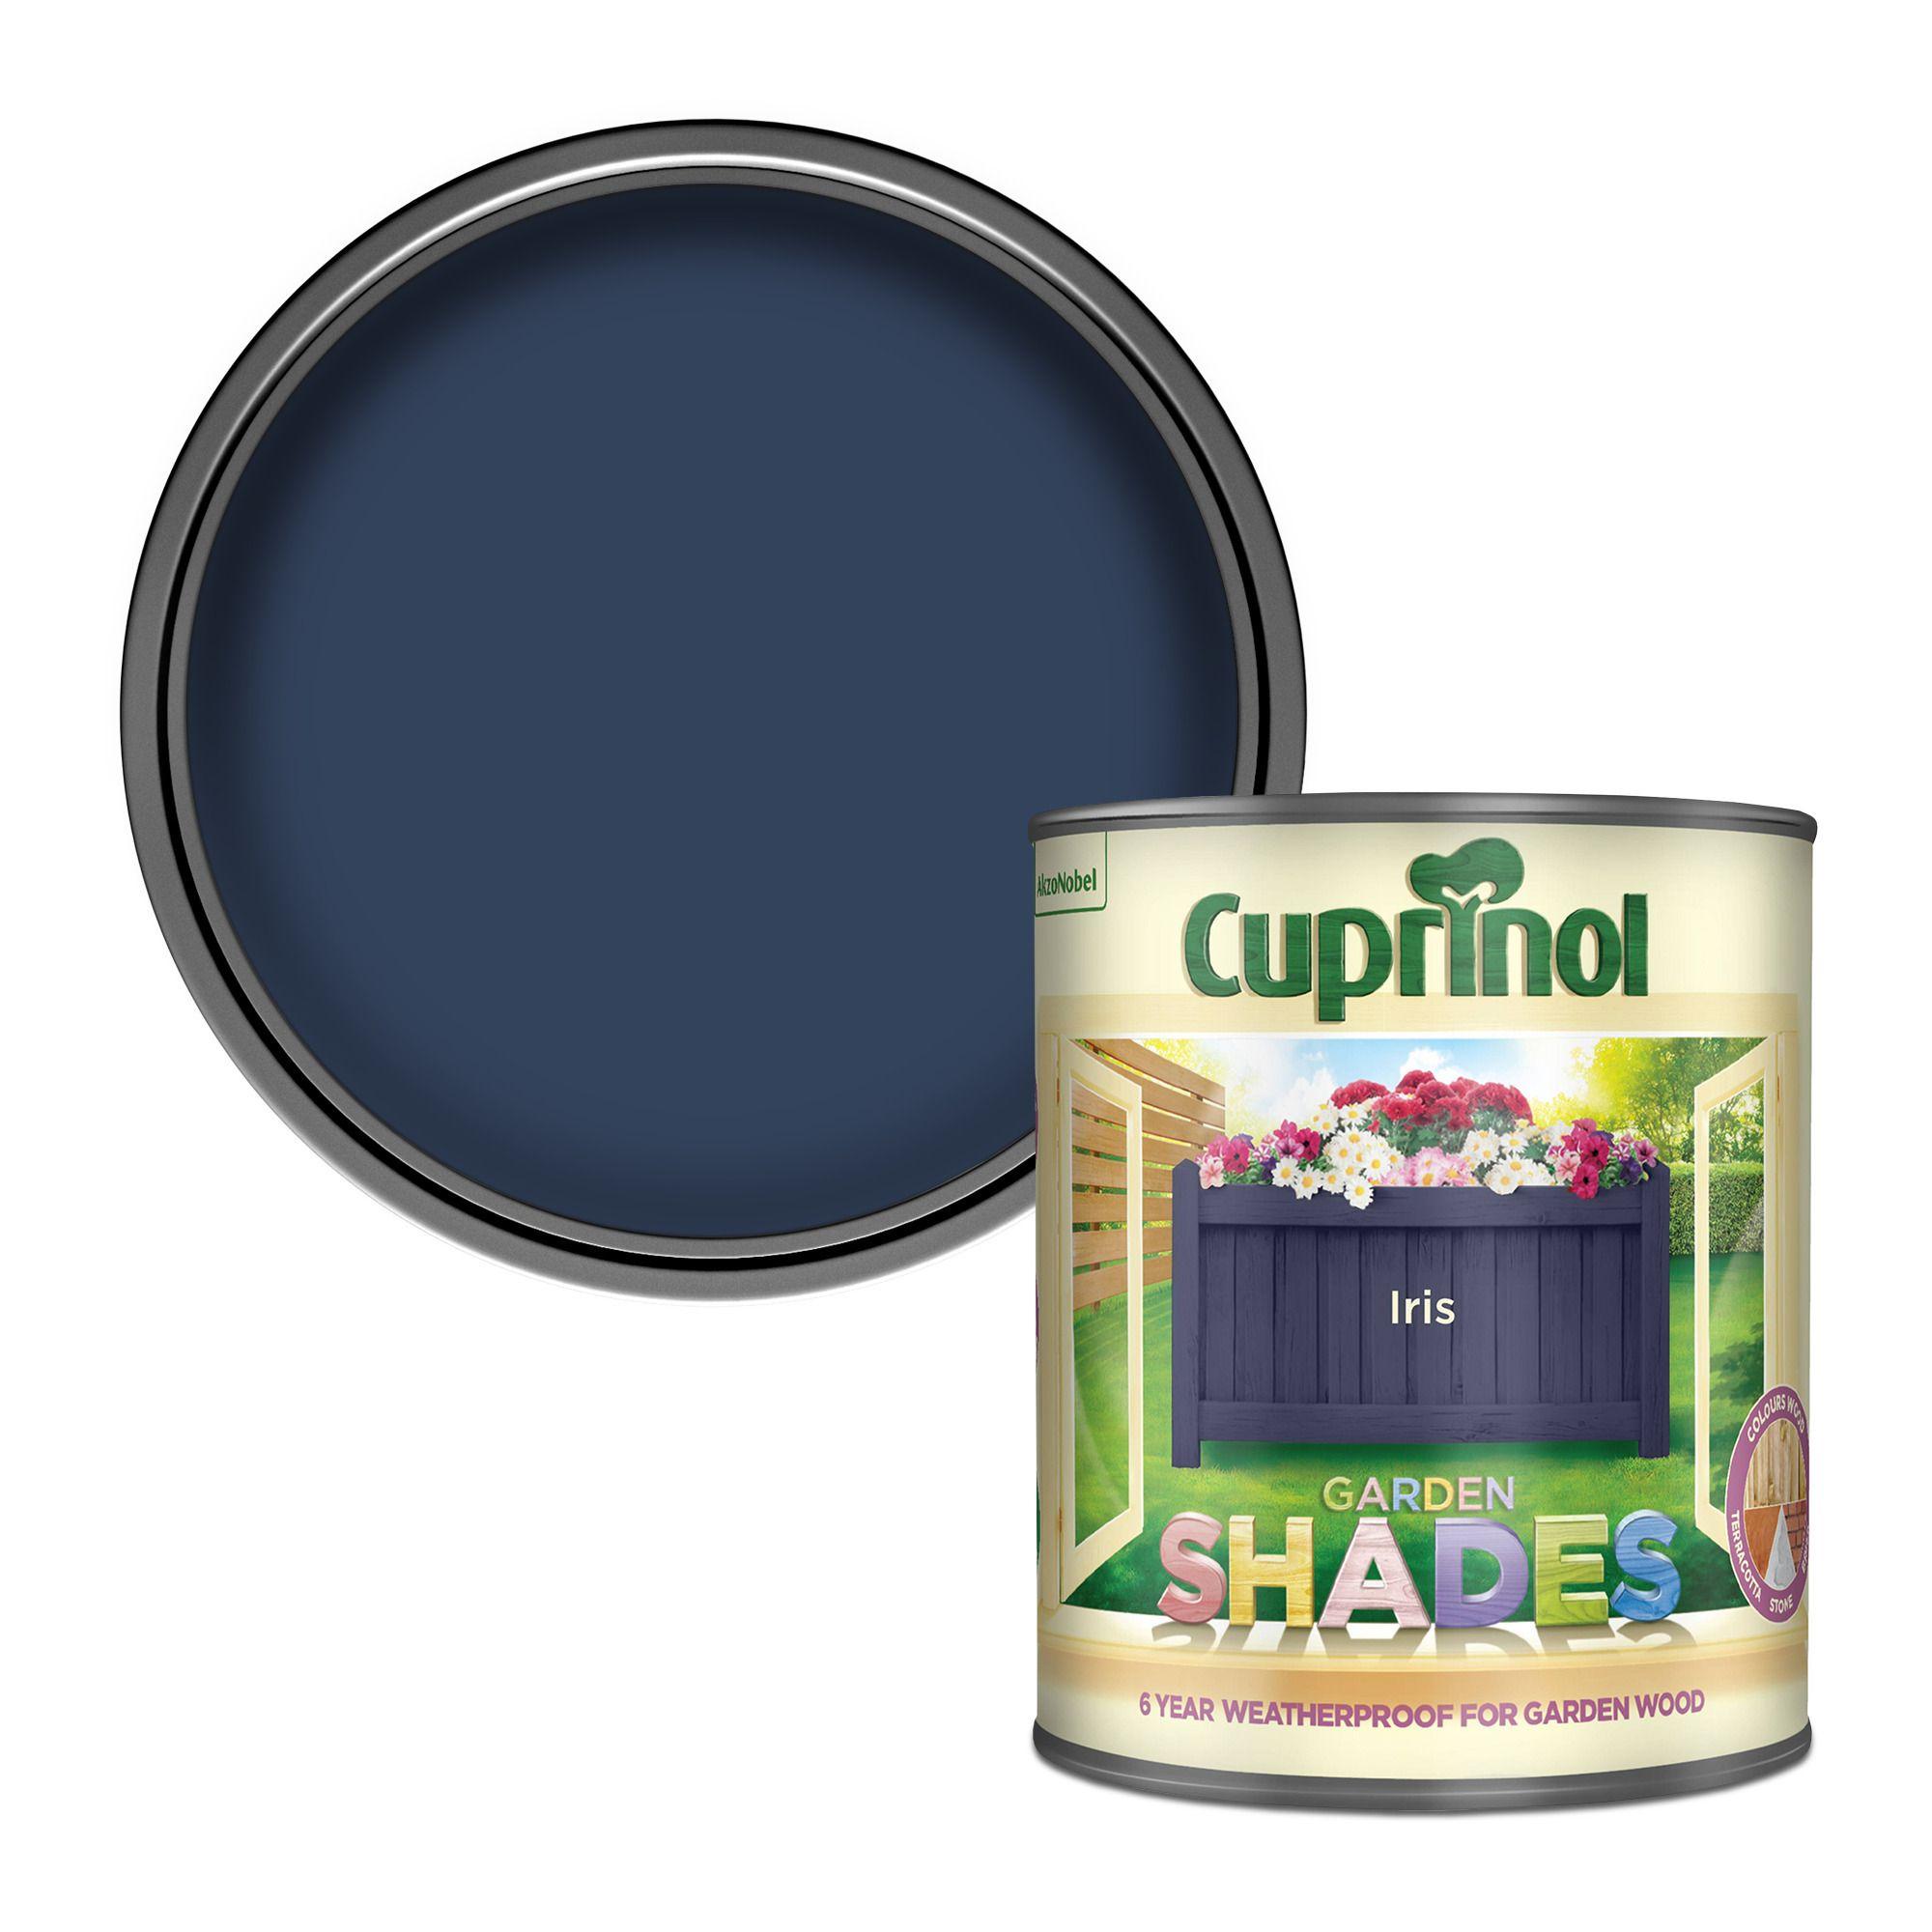 Cuprinol Garden Shades Iris Matt Wood Paint 1 Departments Diy At B Q